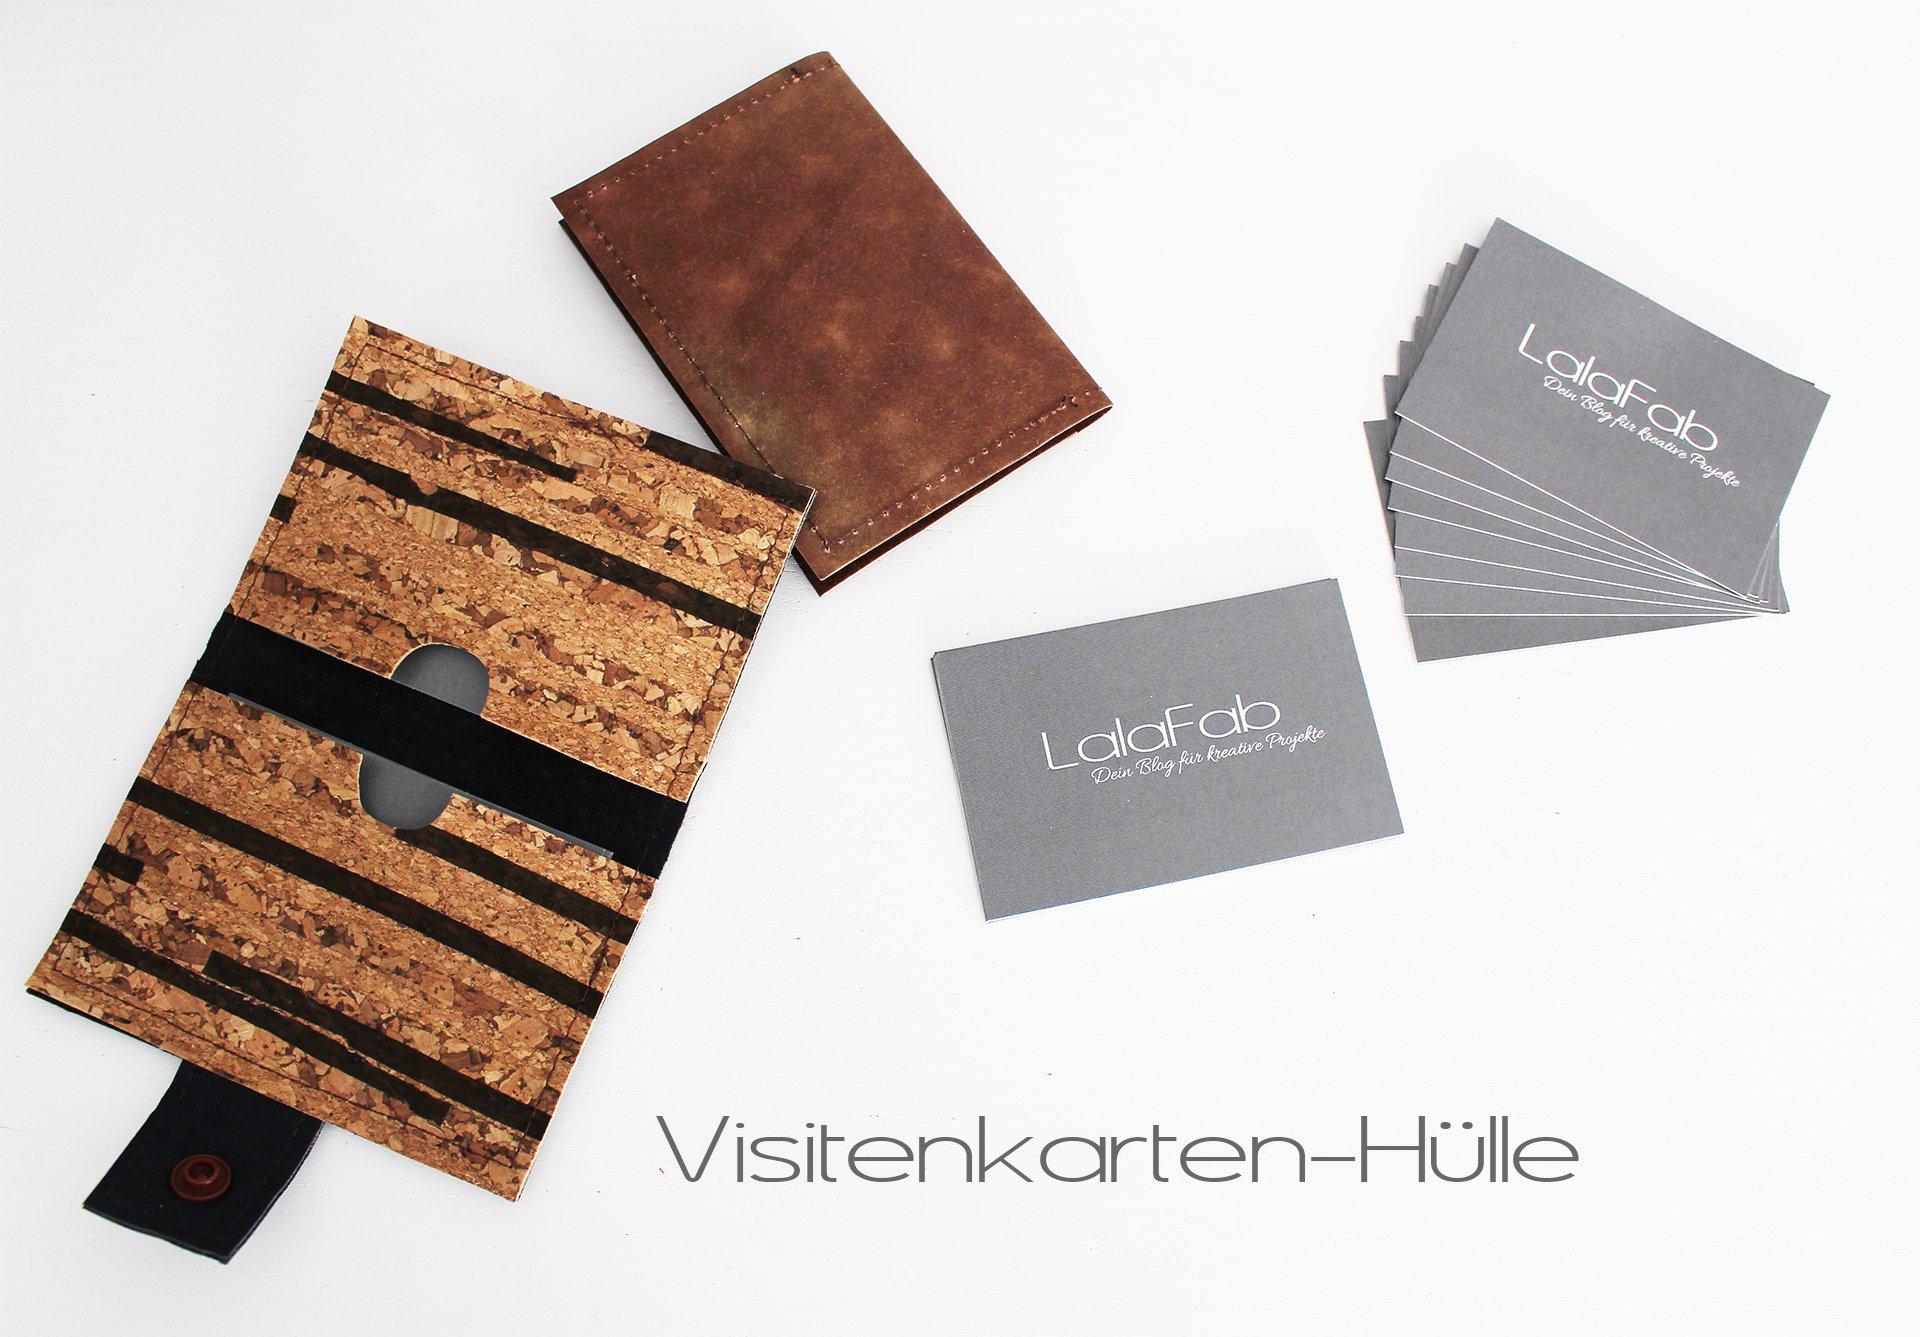 Mini Diy Visitenkarten Hülle Nähen Bernina Blog